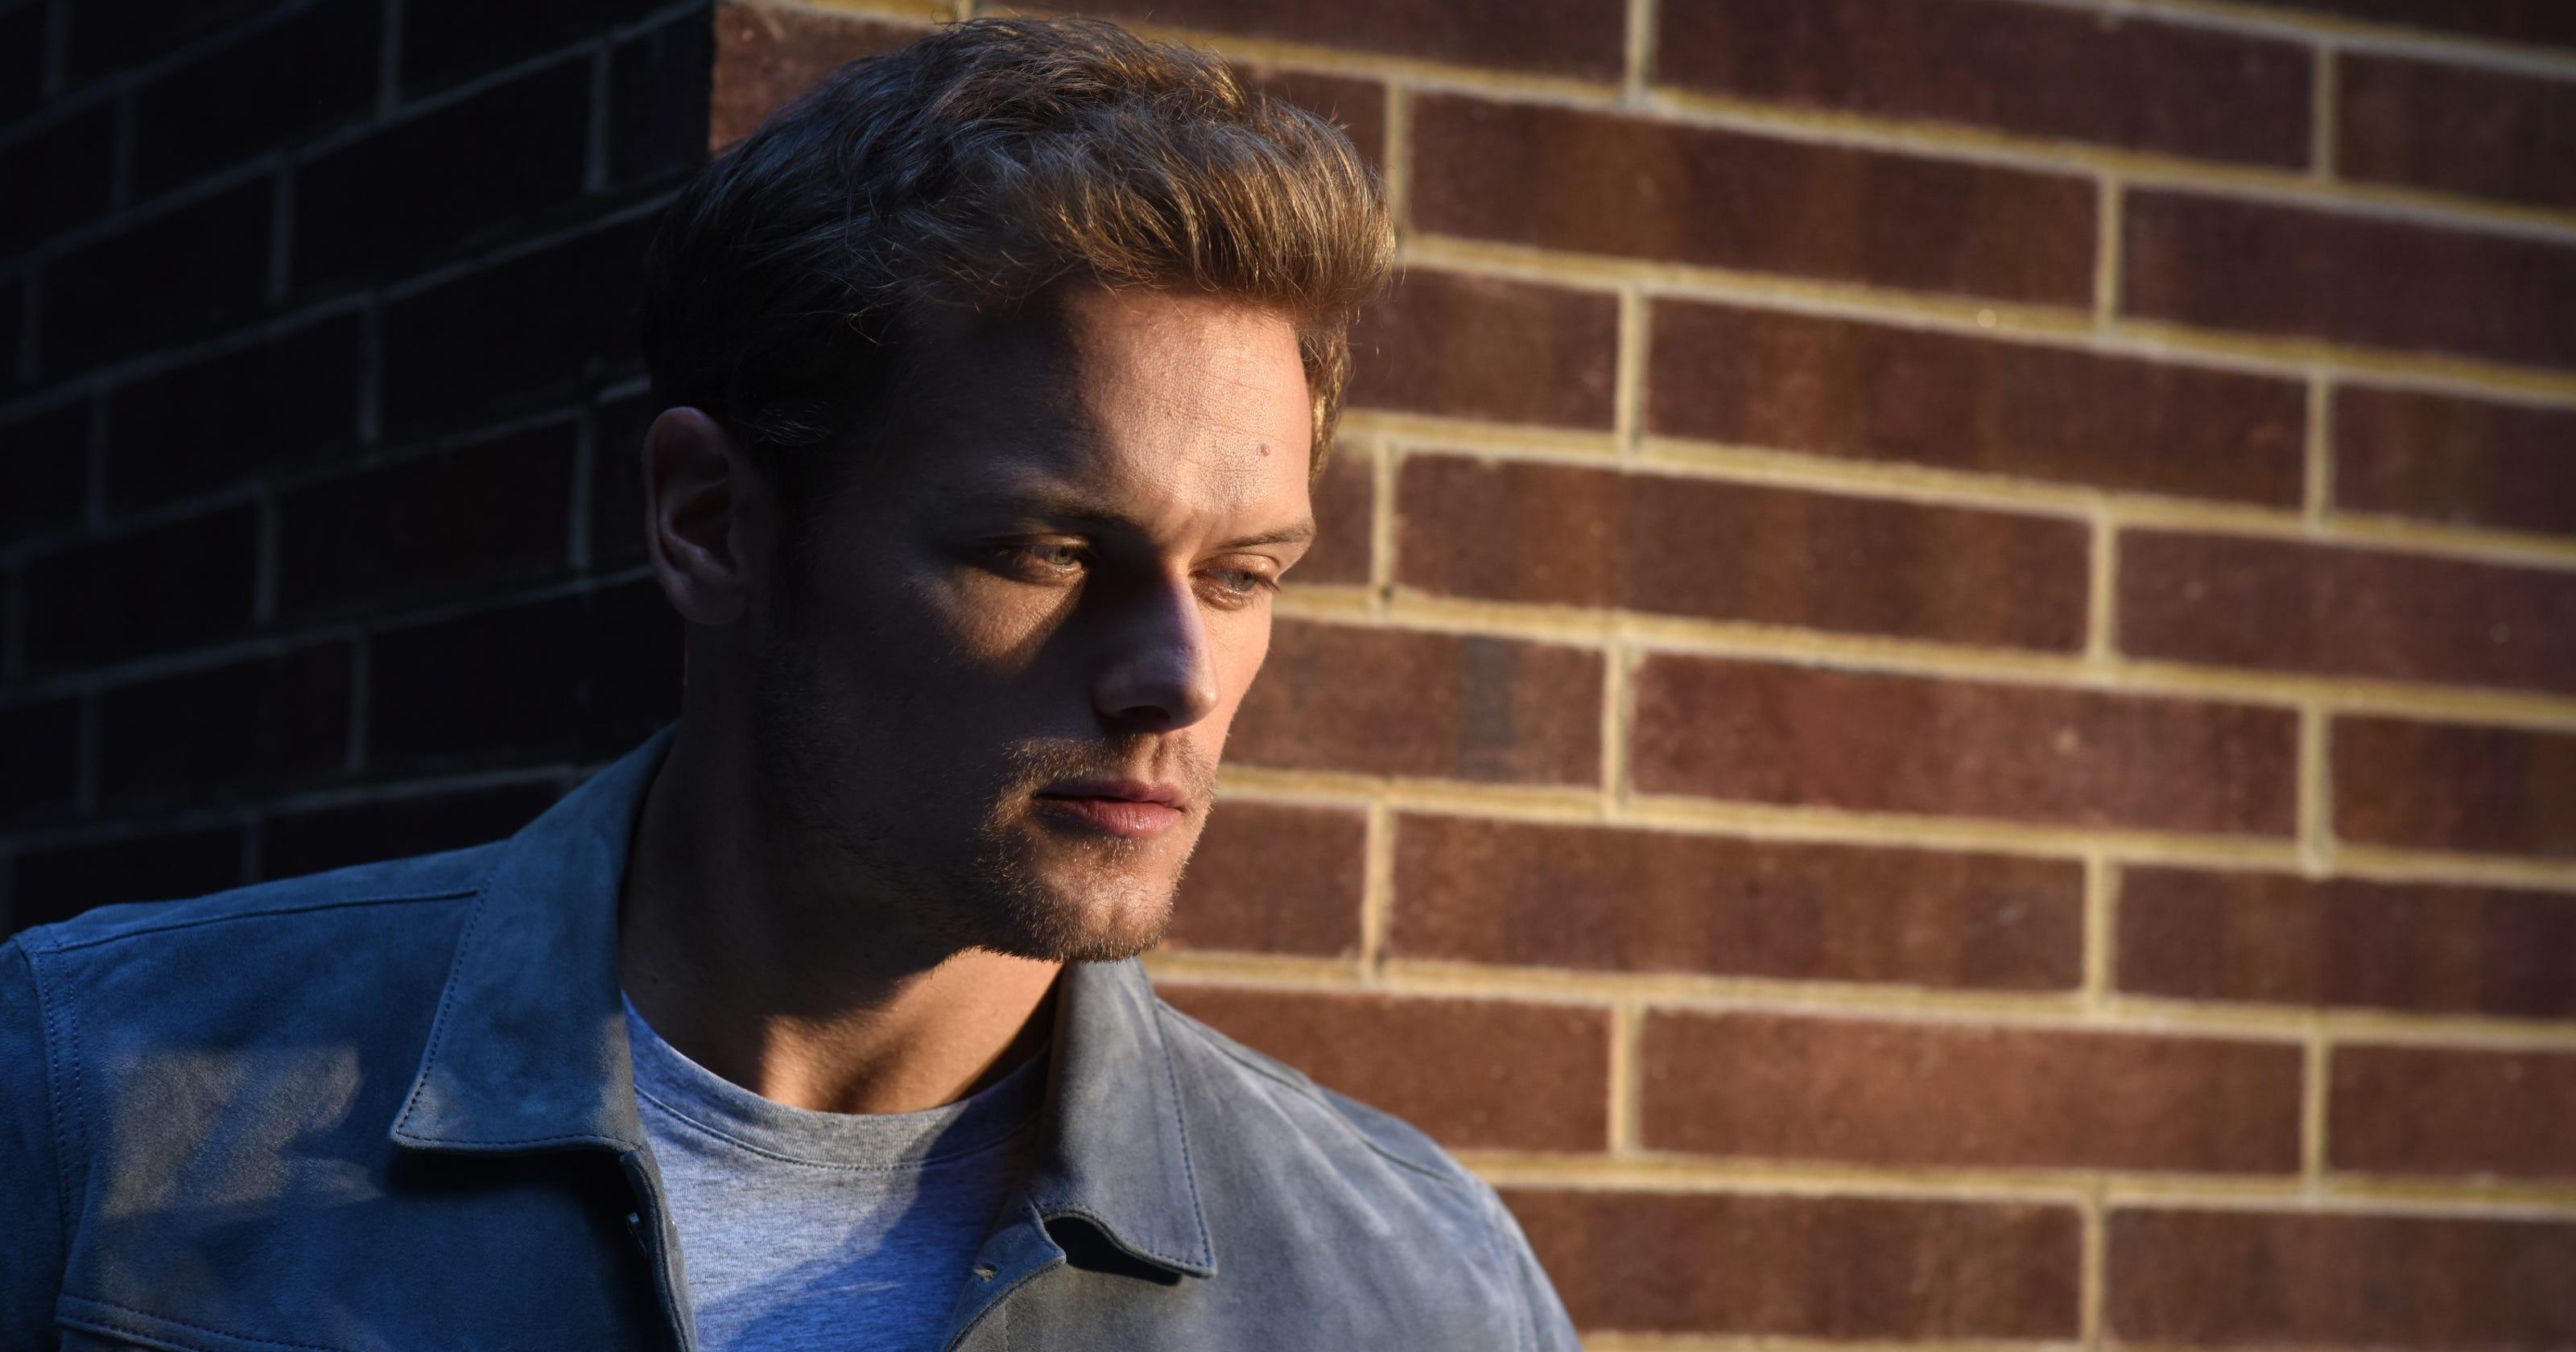 Outlander' heartthrob Sam Heughan is on the brink movie stardom